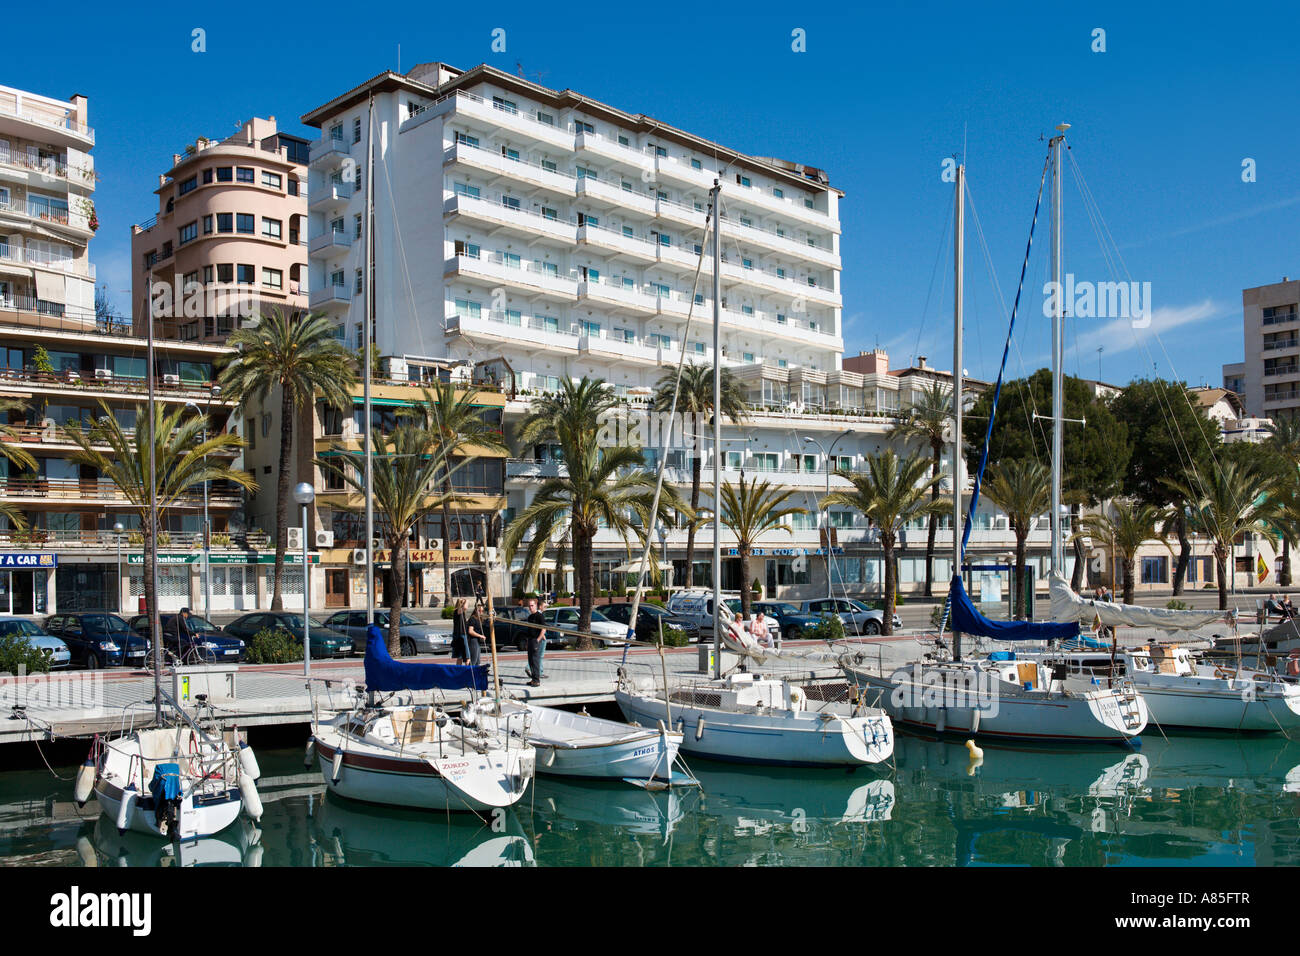 Hotel Costa Azul Palma De Maiorca